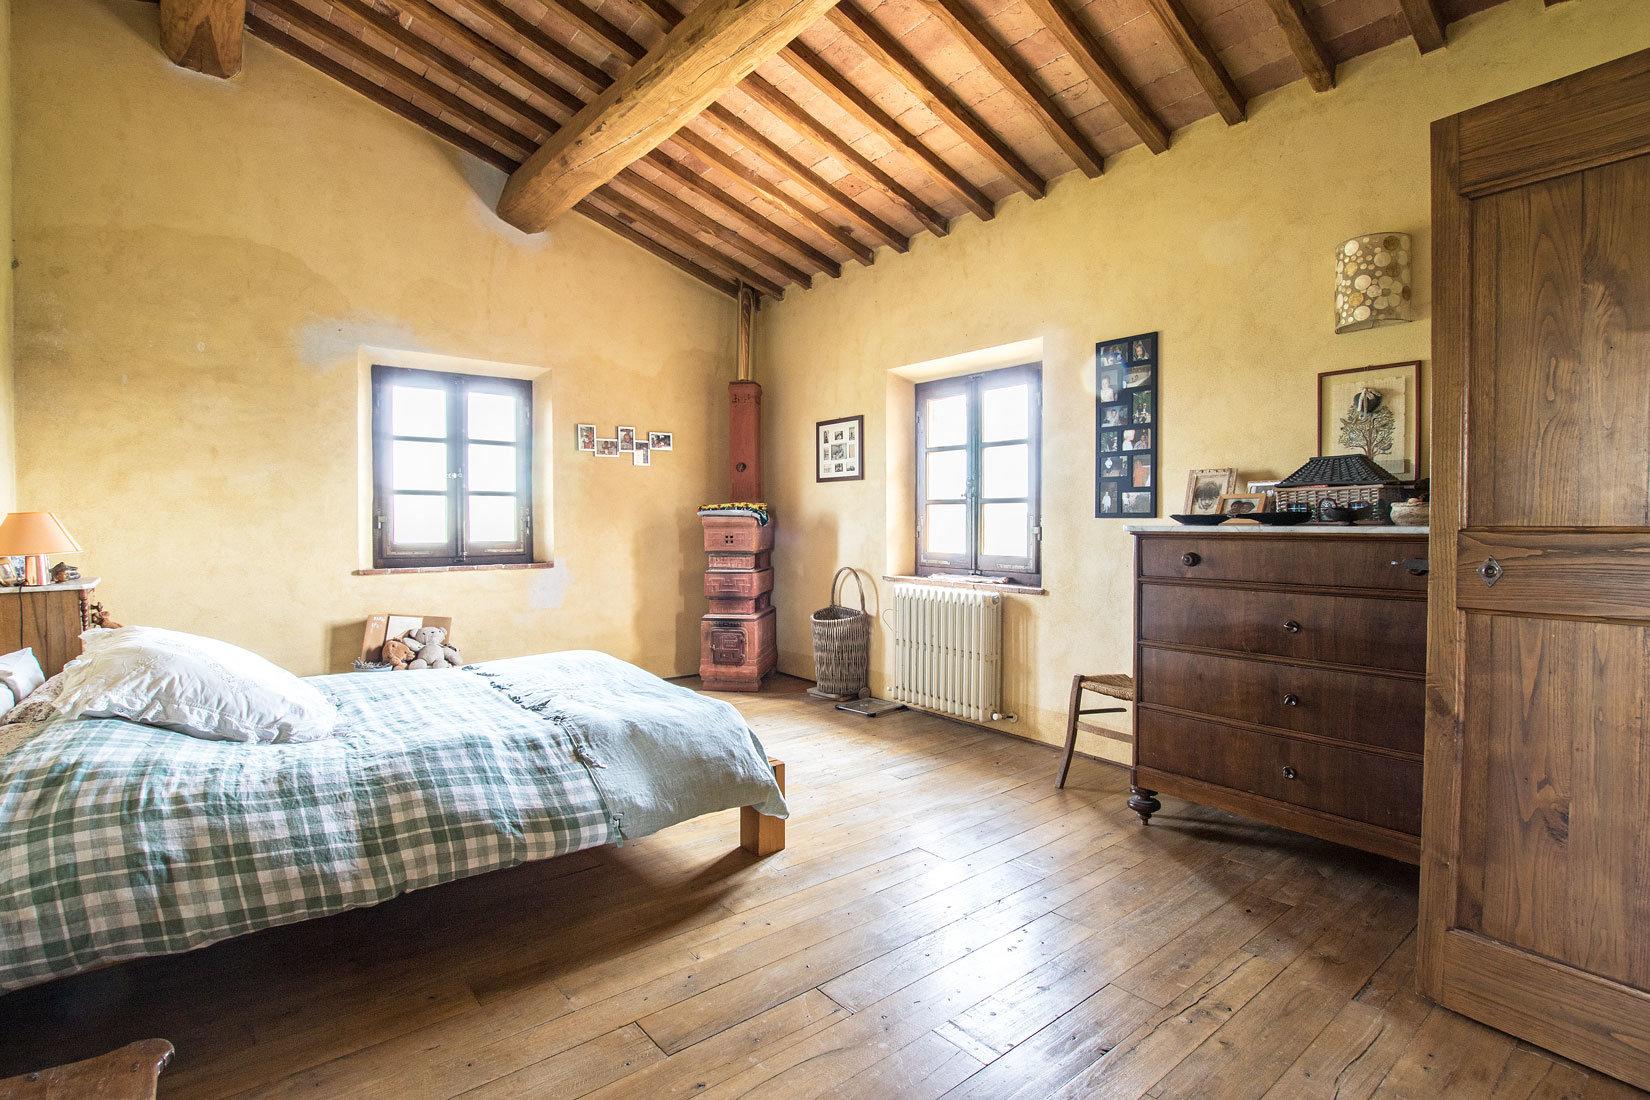 Venta Casa - Monteroni d'Arbia - Italia